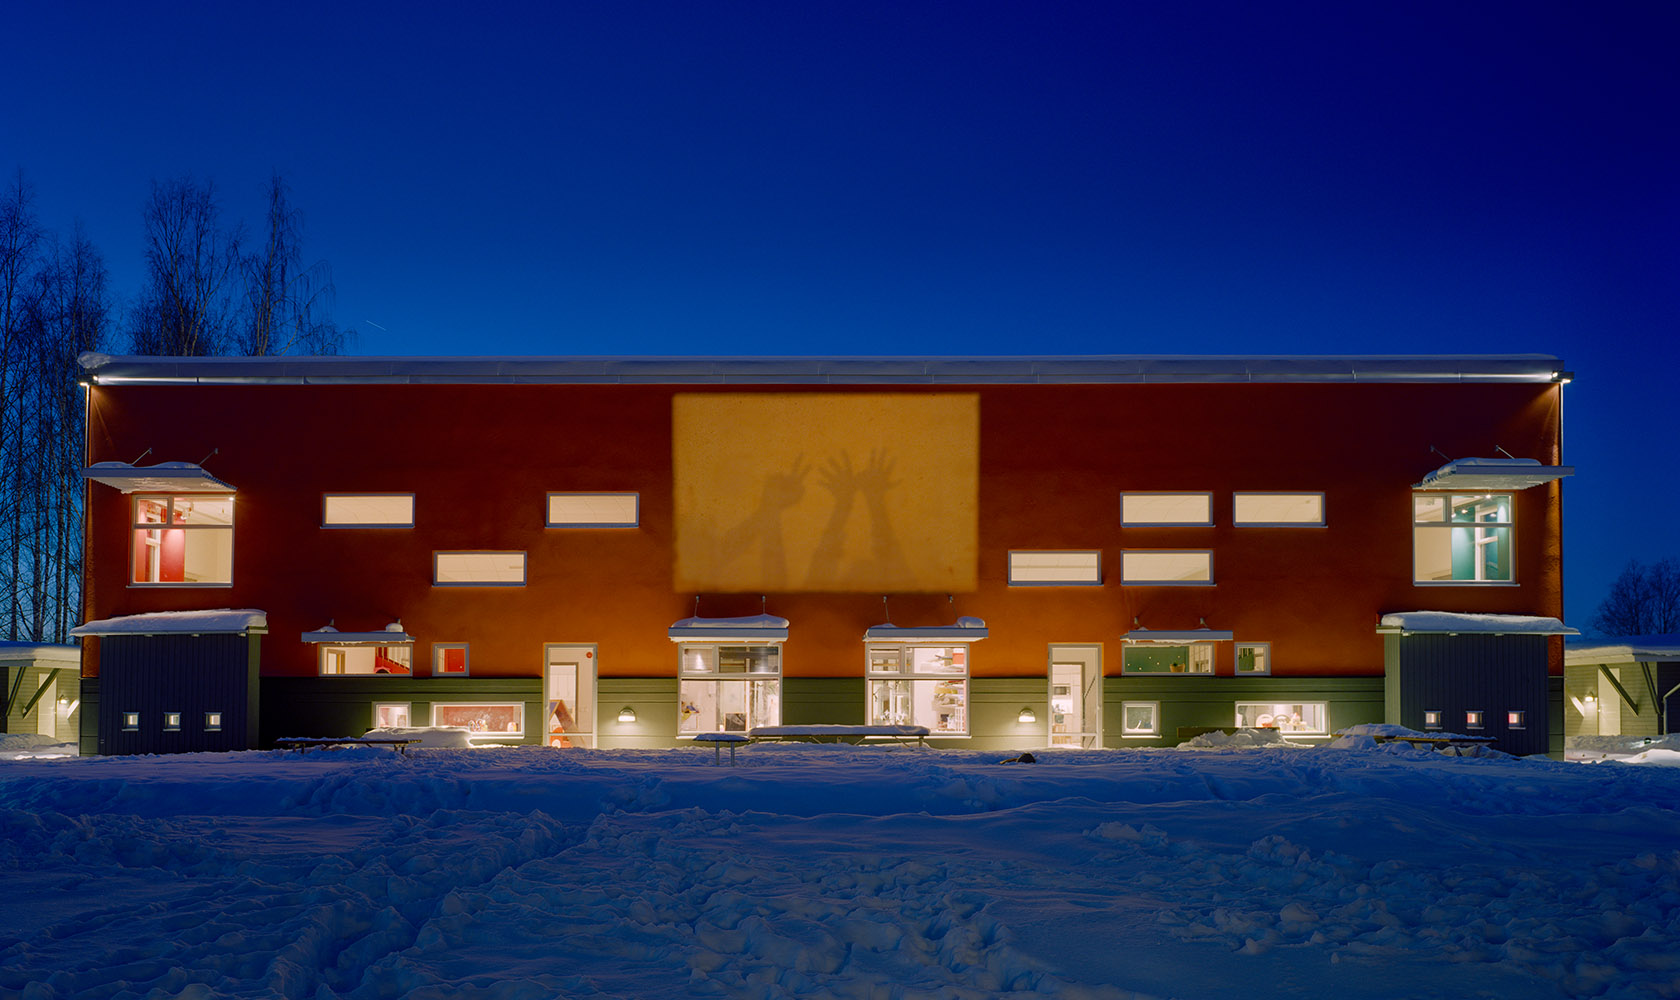 Matildelunds förskola